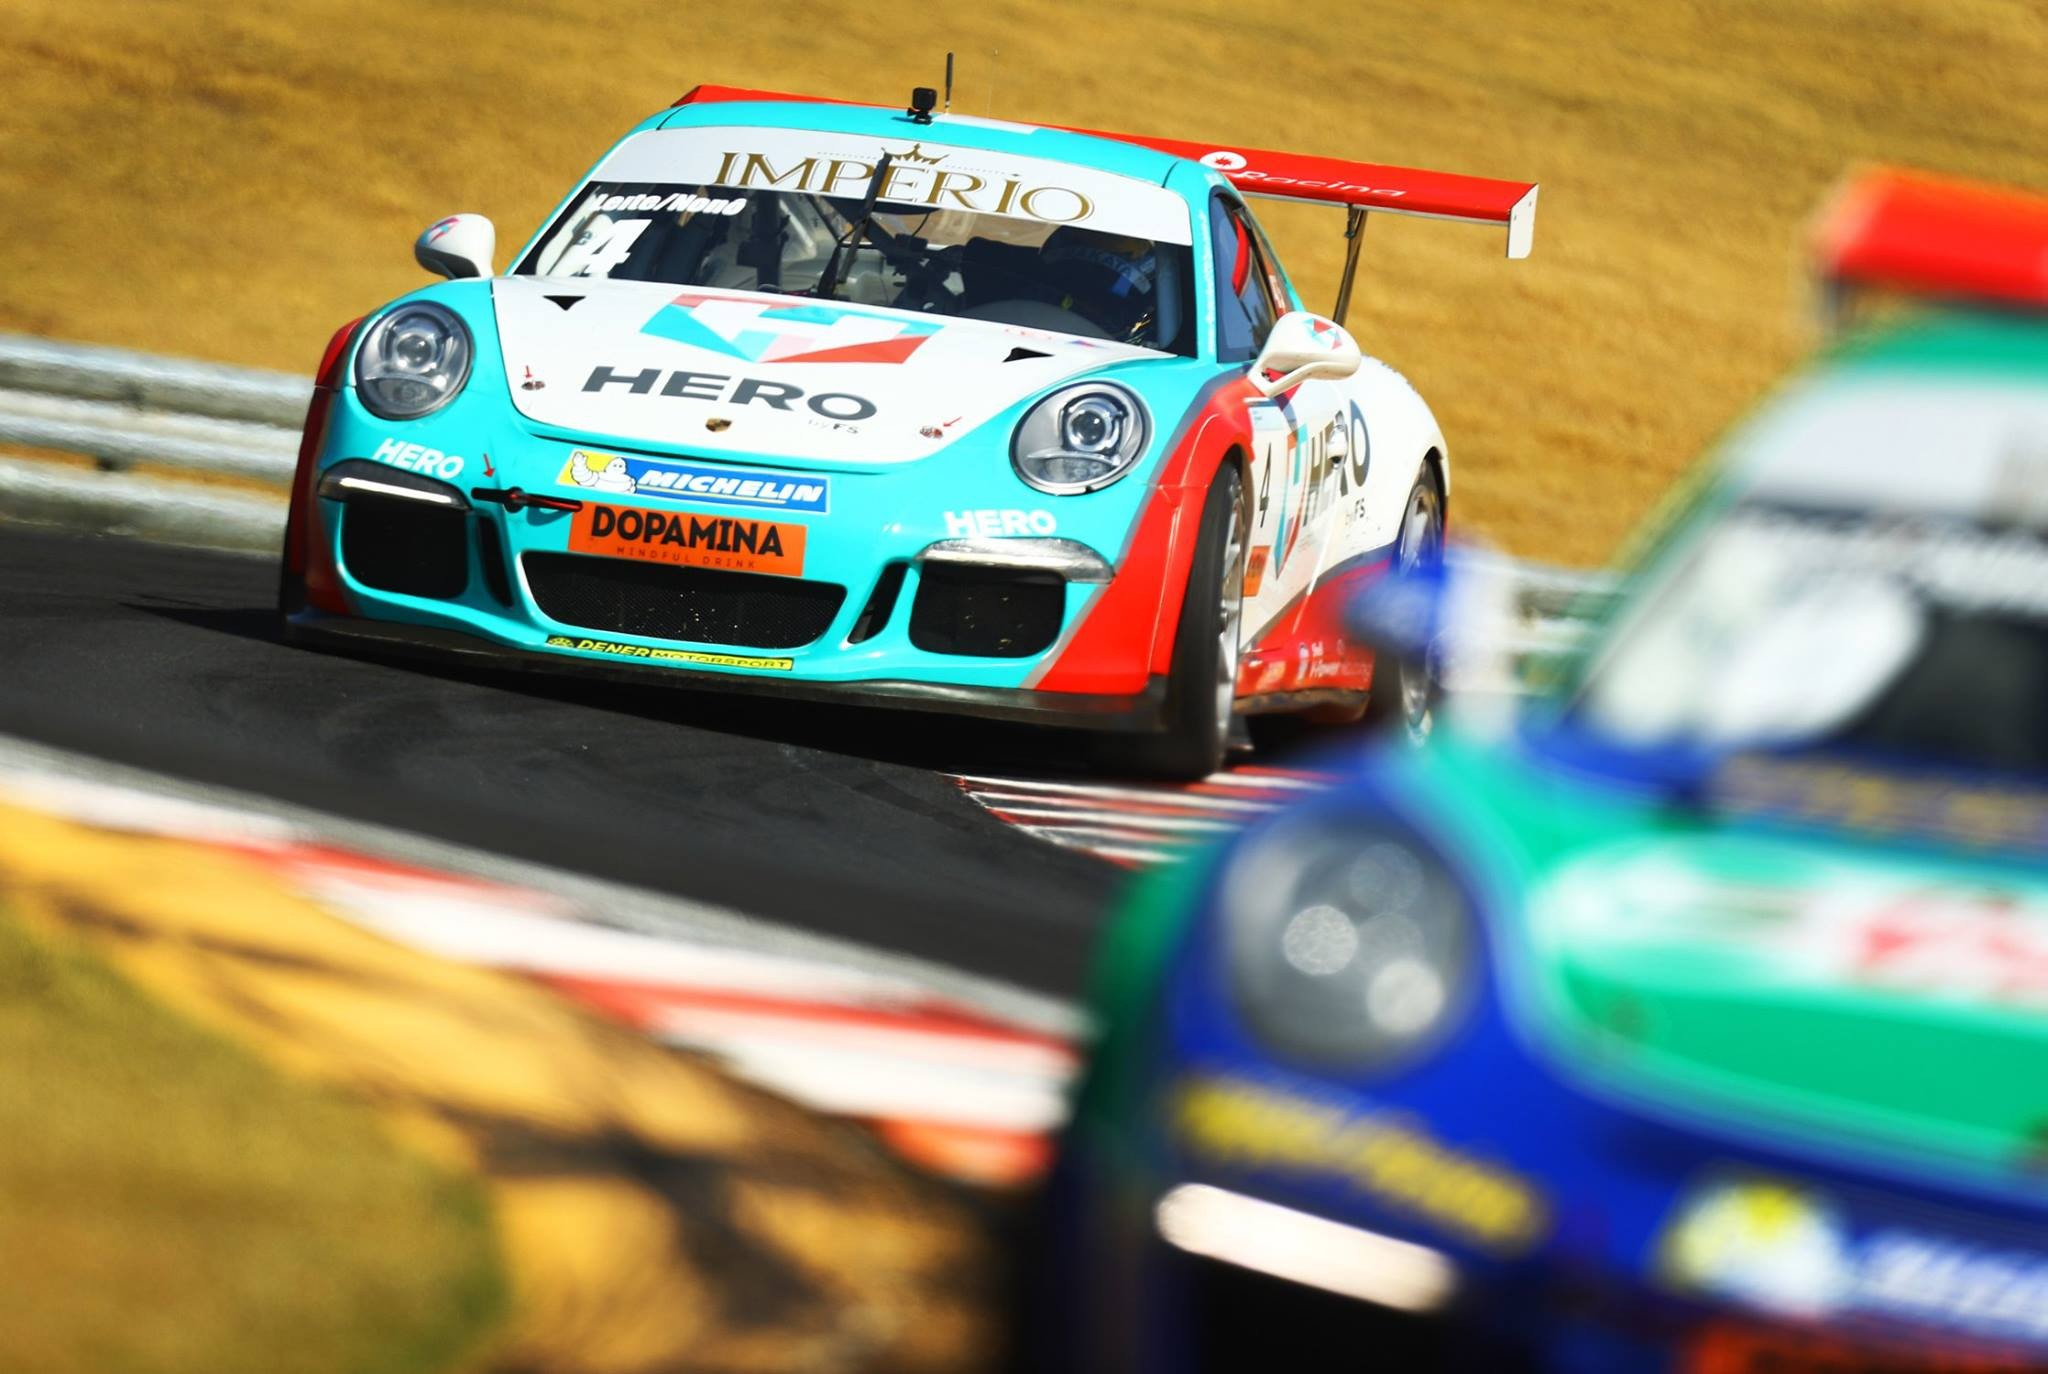 O Porsche da categoria Cup da dupla Beto Leite/Nonô Figueiredo #4 entrando na curva do S em descida (Foto: Porsche Império GT3 Cup/Luca Bassani)